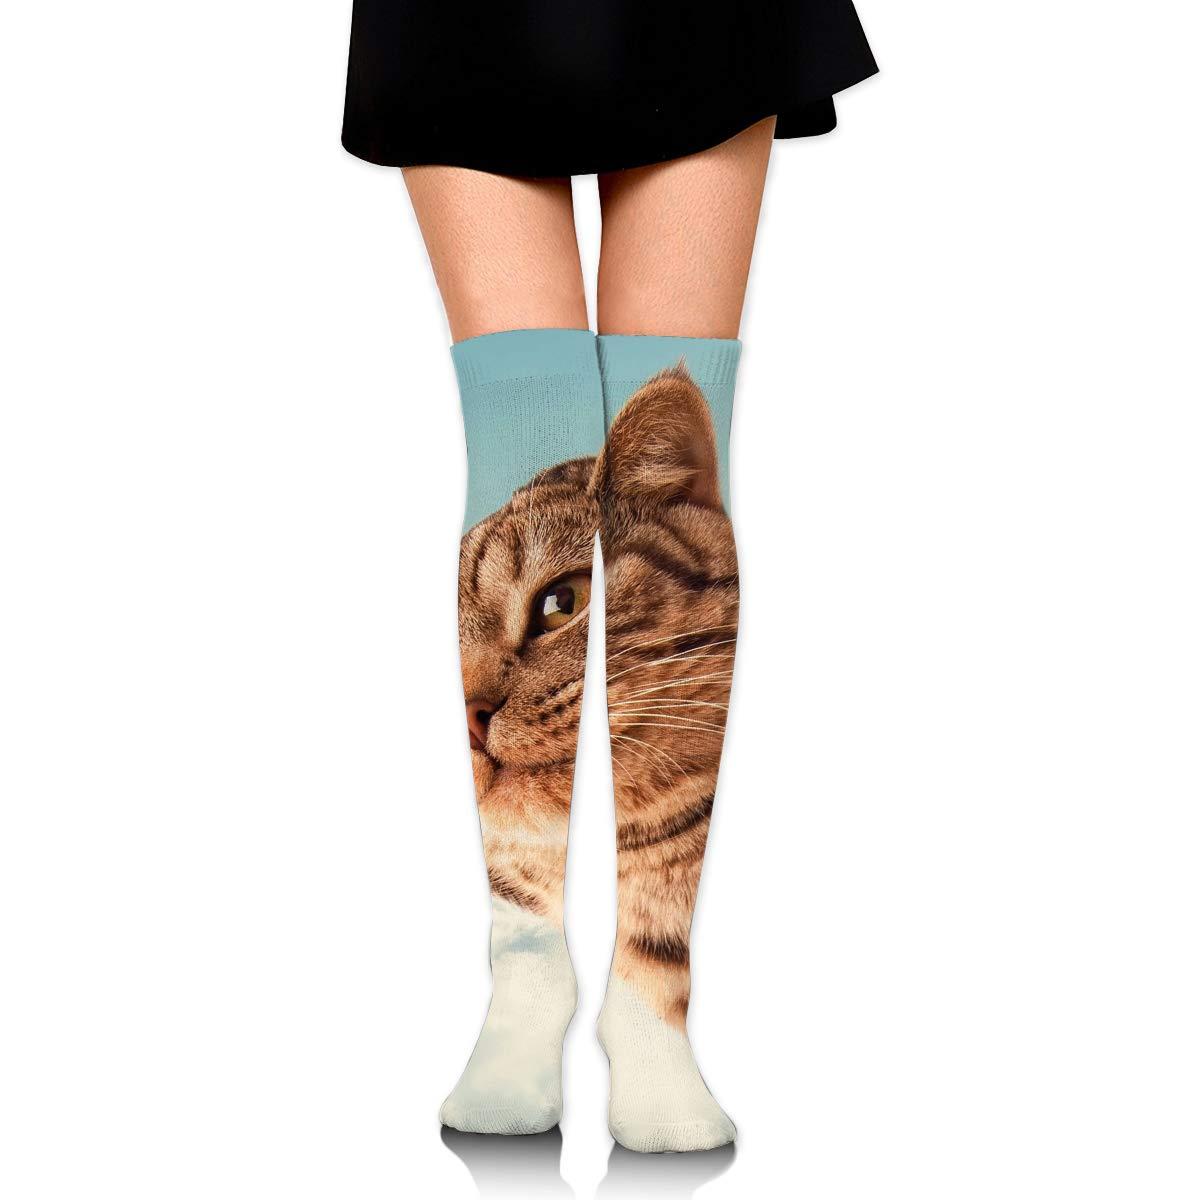 High Elasticity Girl Cotton Knee High Socks Uniform Cat I Belive I Can Fly Women Tube Socks